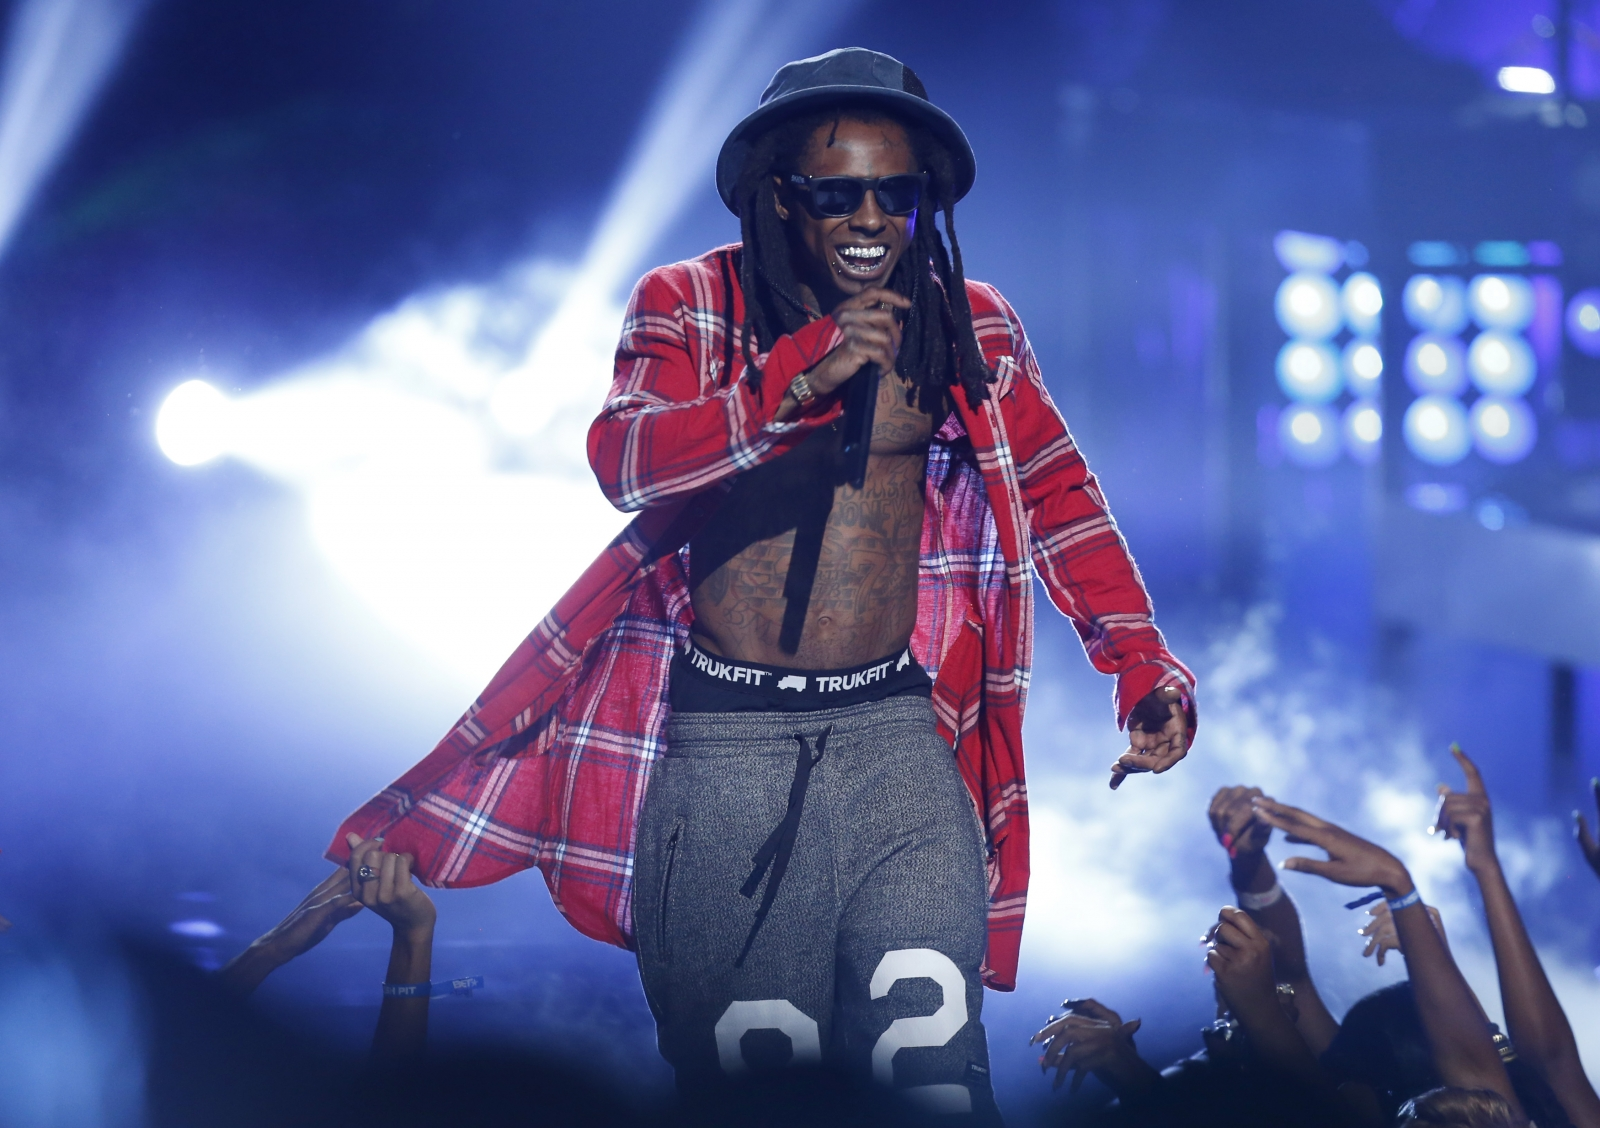 Lil wayne leaving cash money for jay z s roc nation rapper denies he